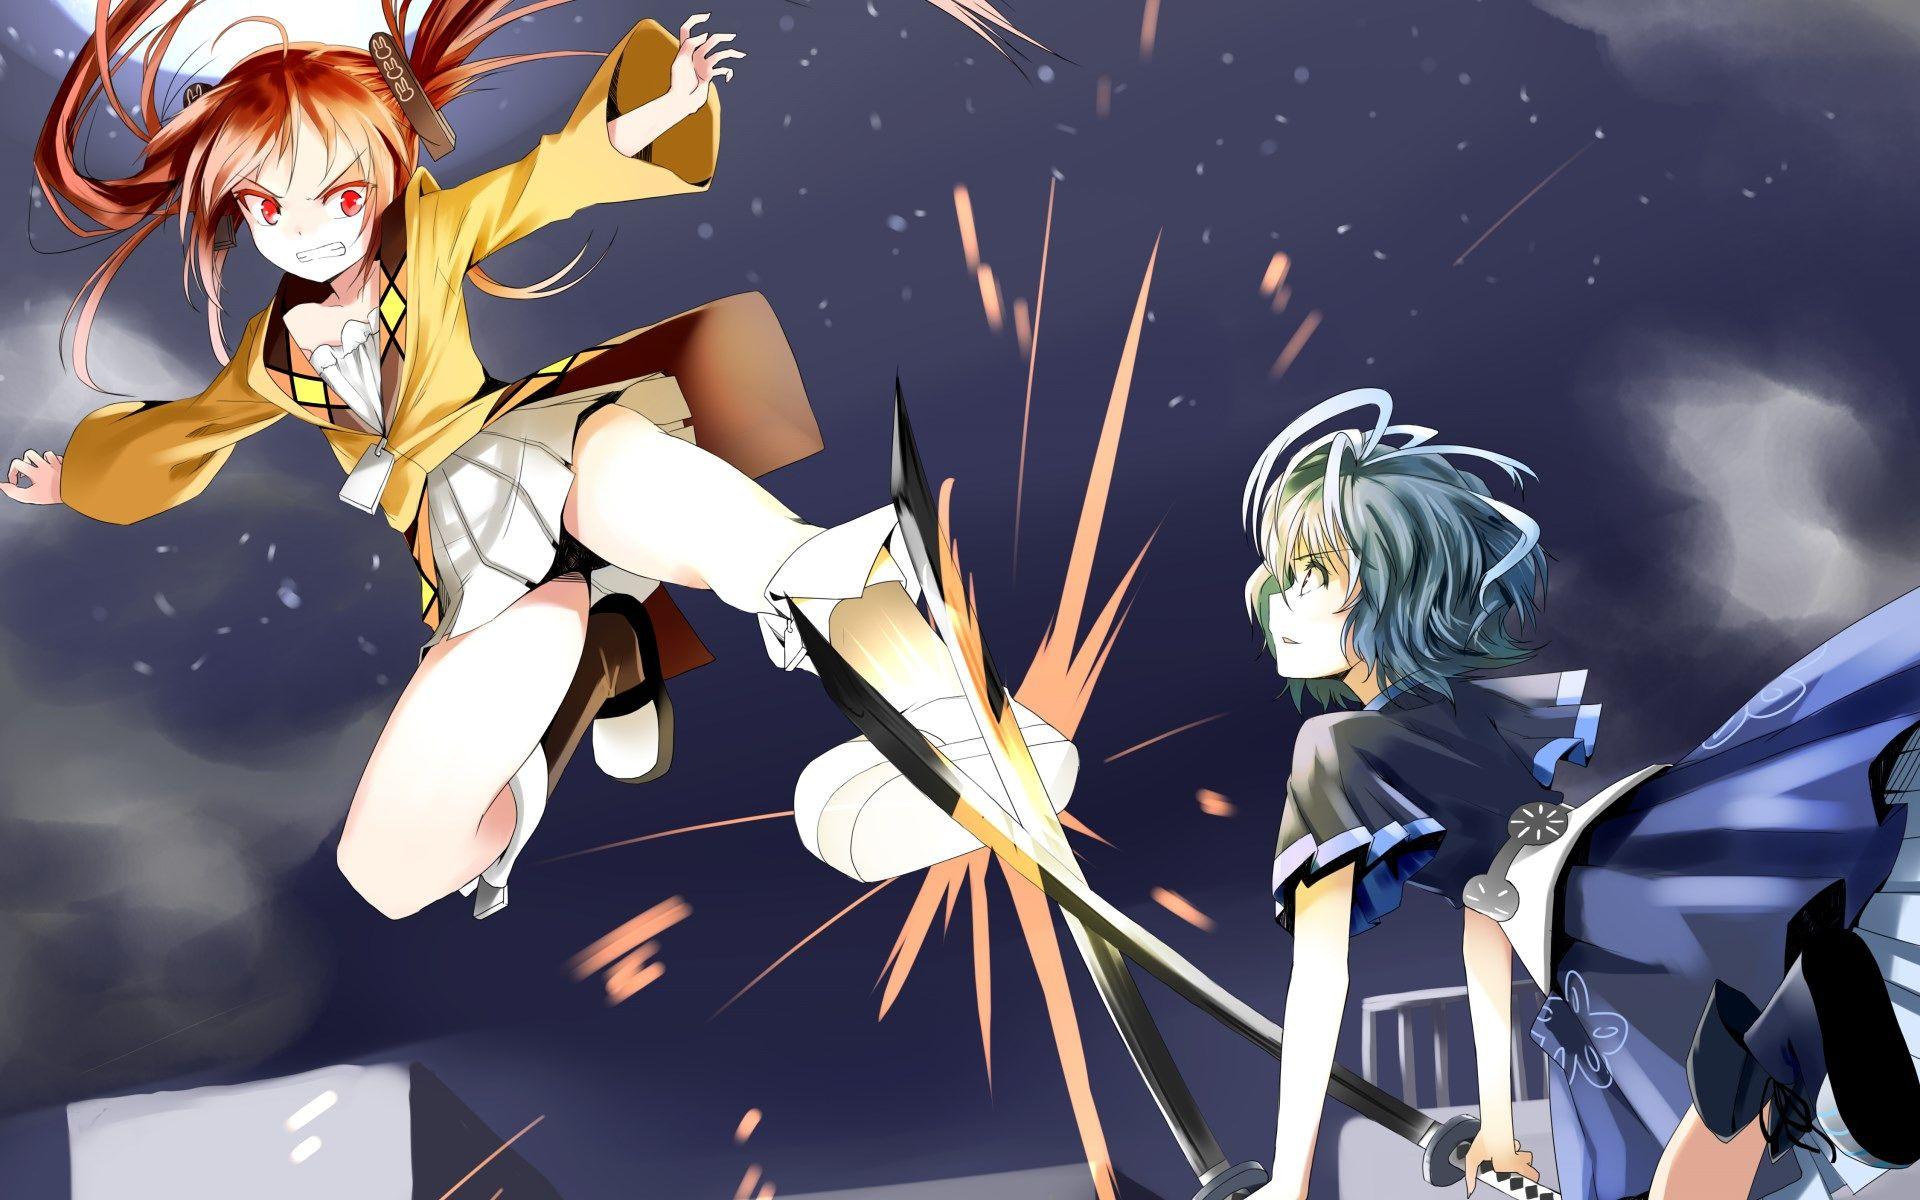 Serie anime black bullet Bullets, Posts and Black bullet